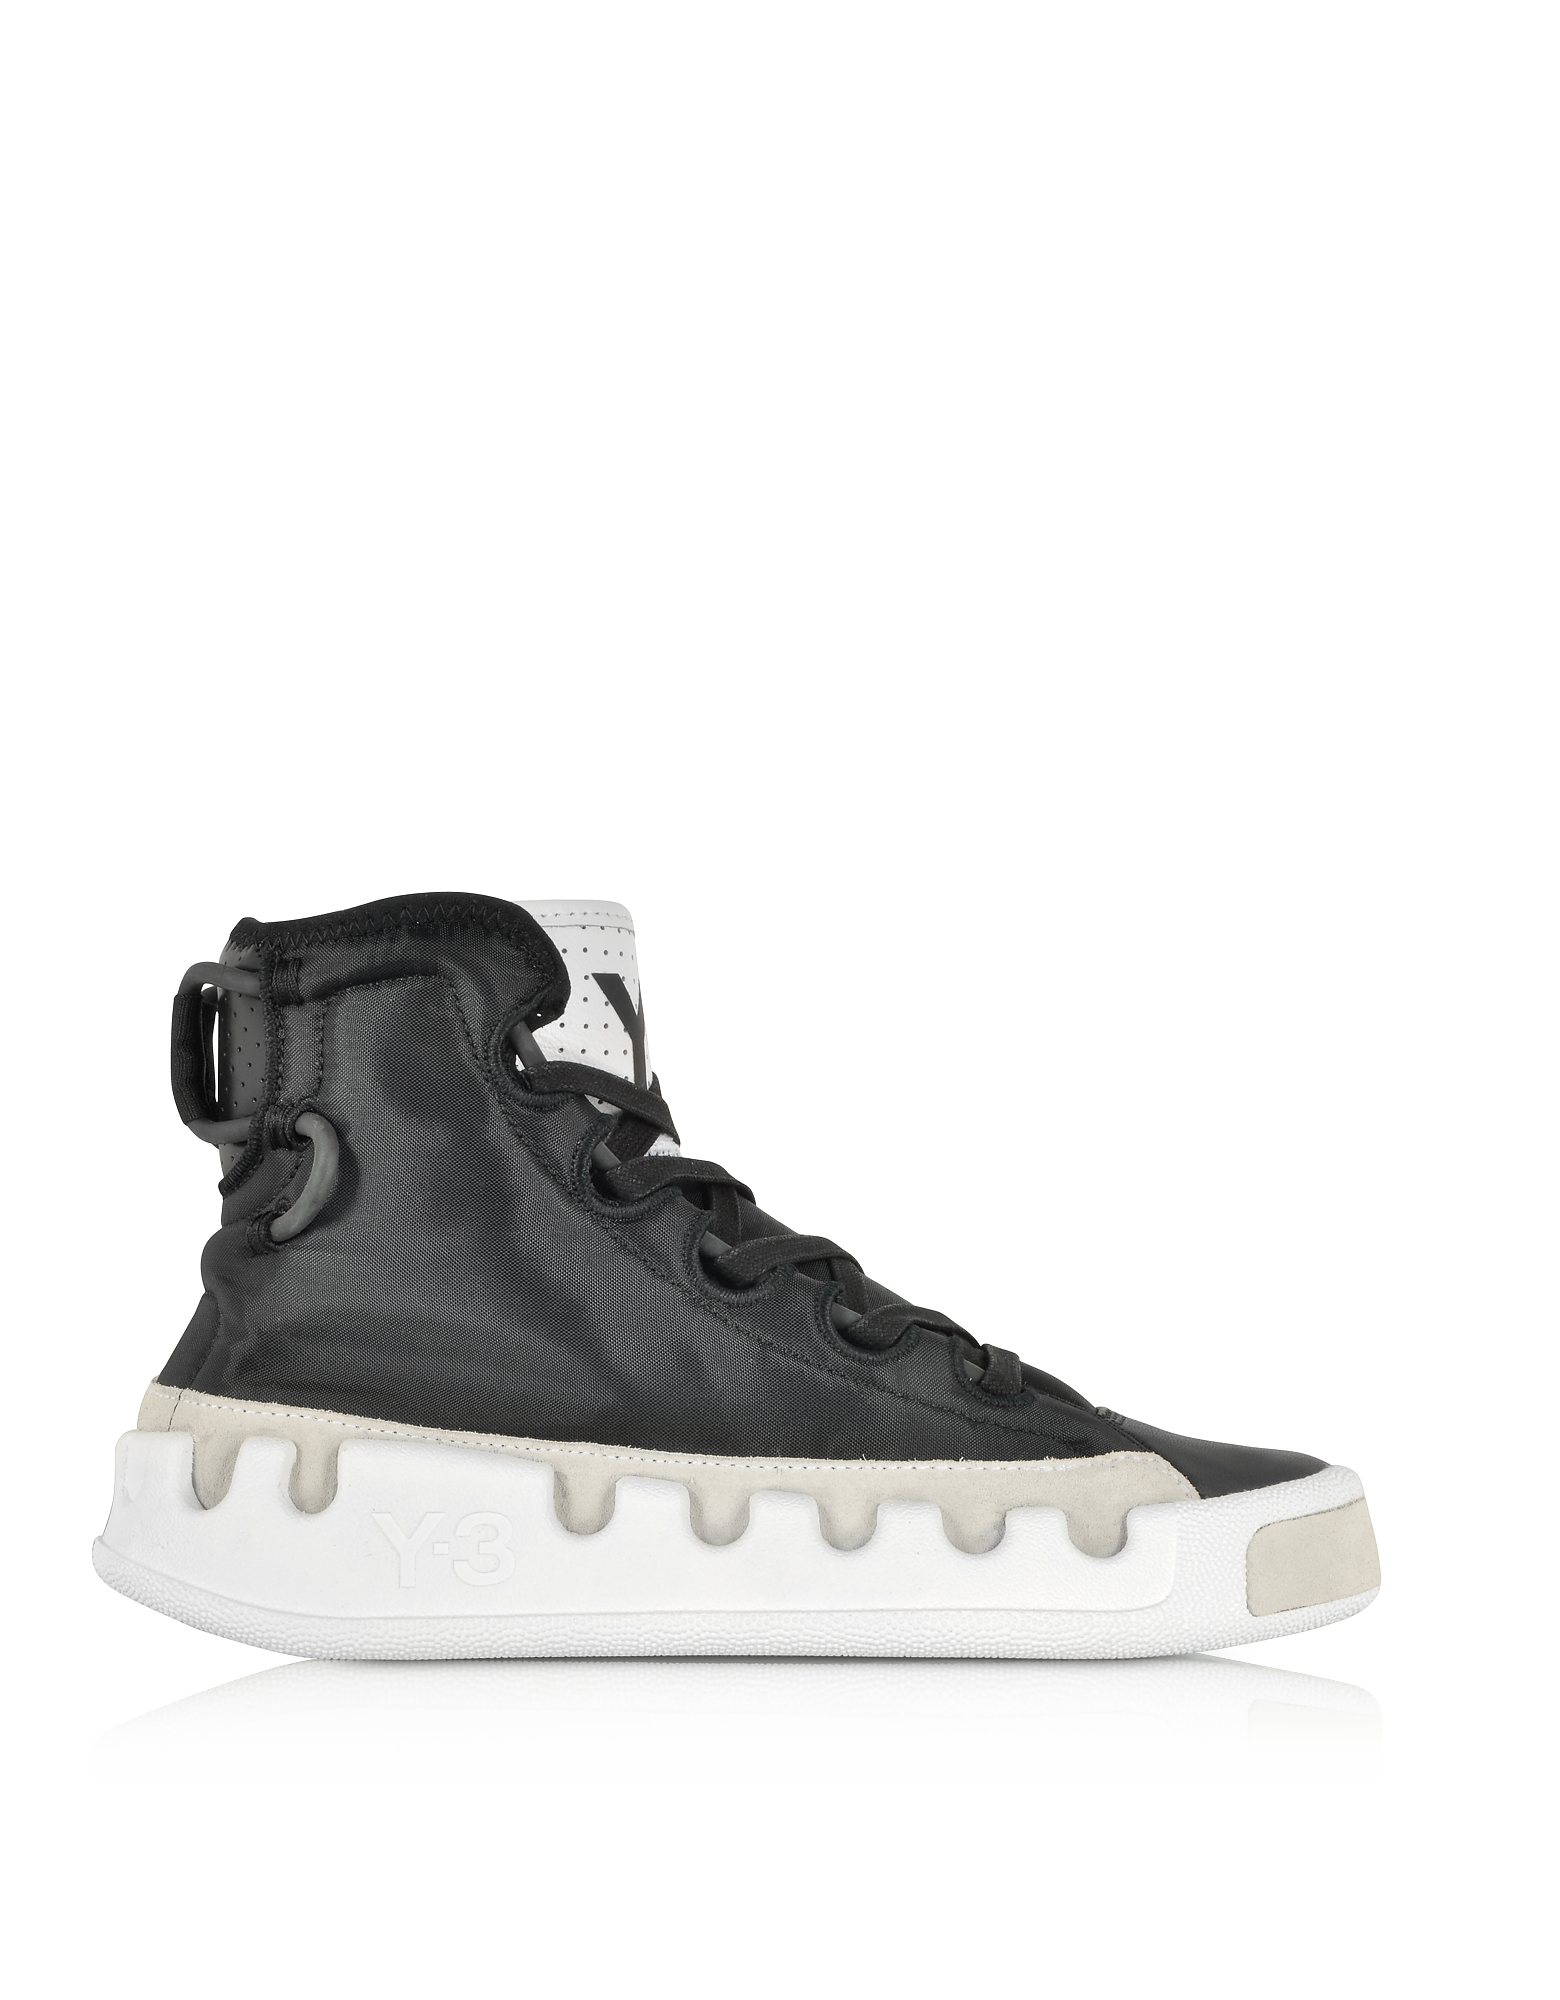 Y-3 Kasabaru Black Nylon High-Top Men's Sneakers